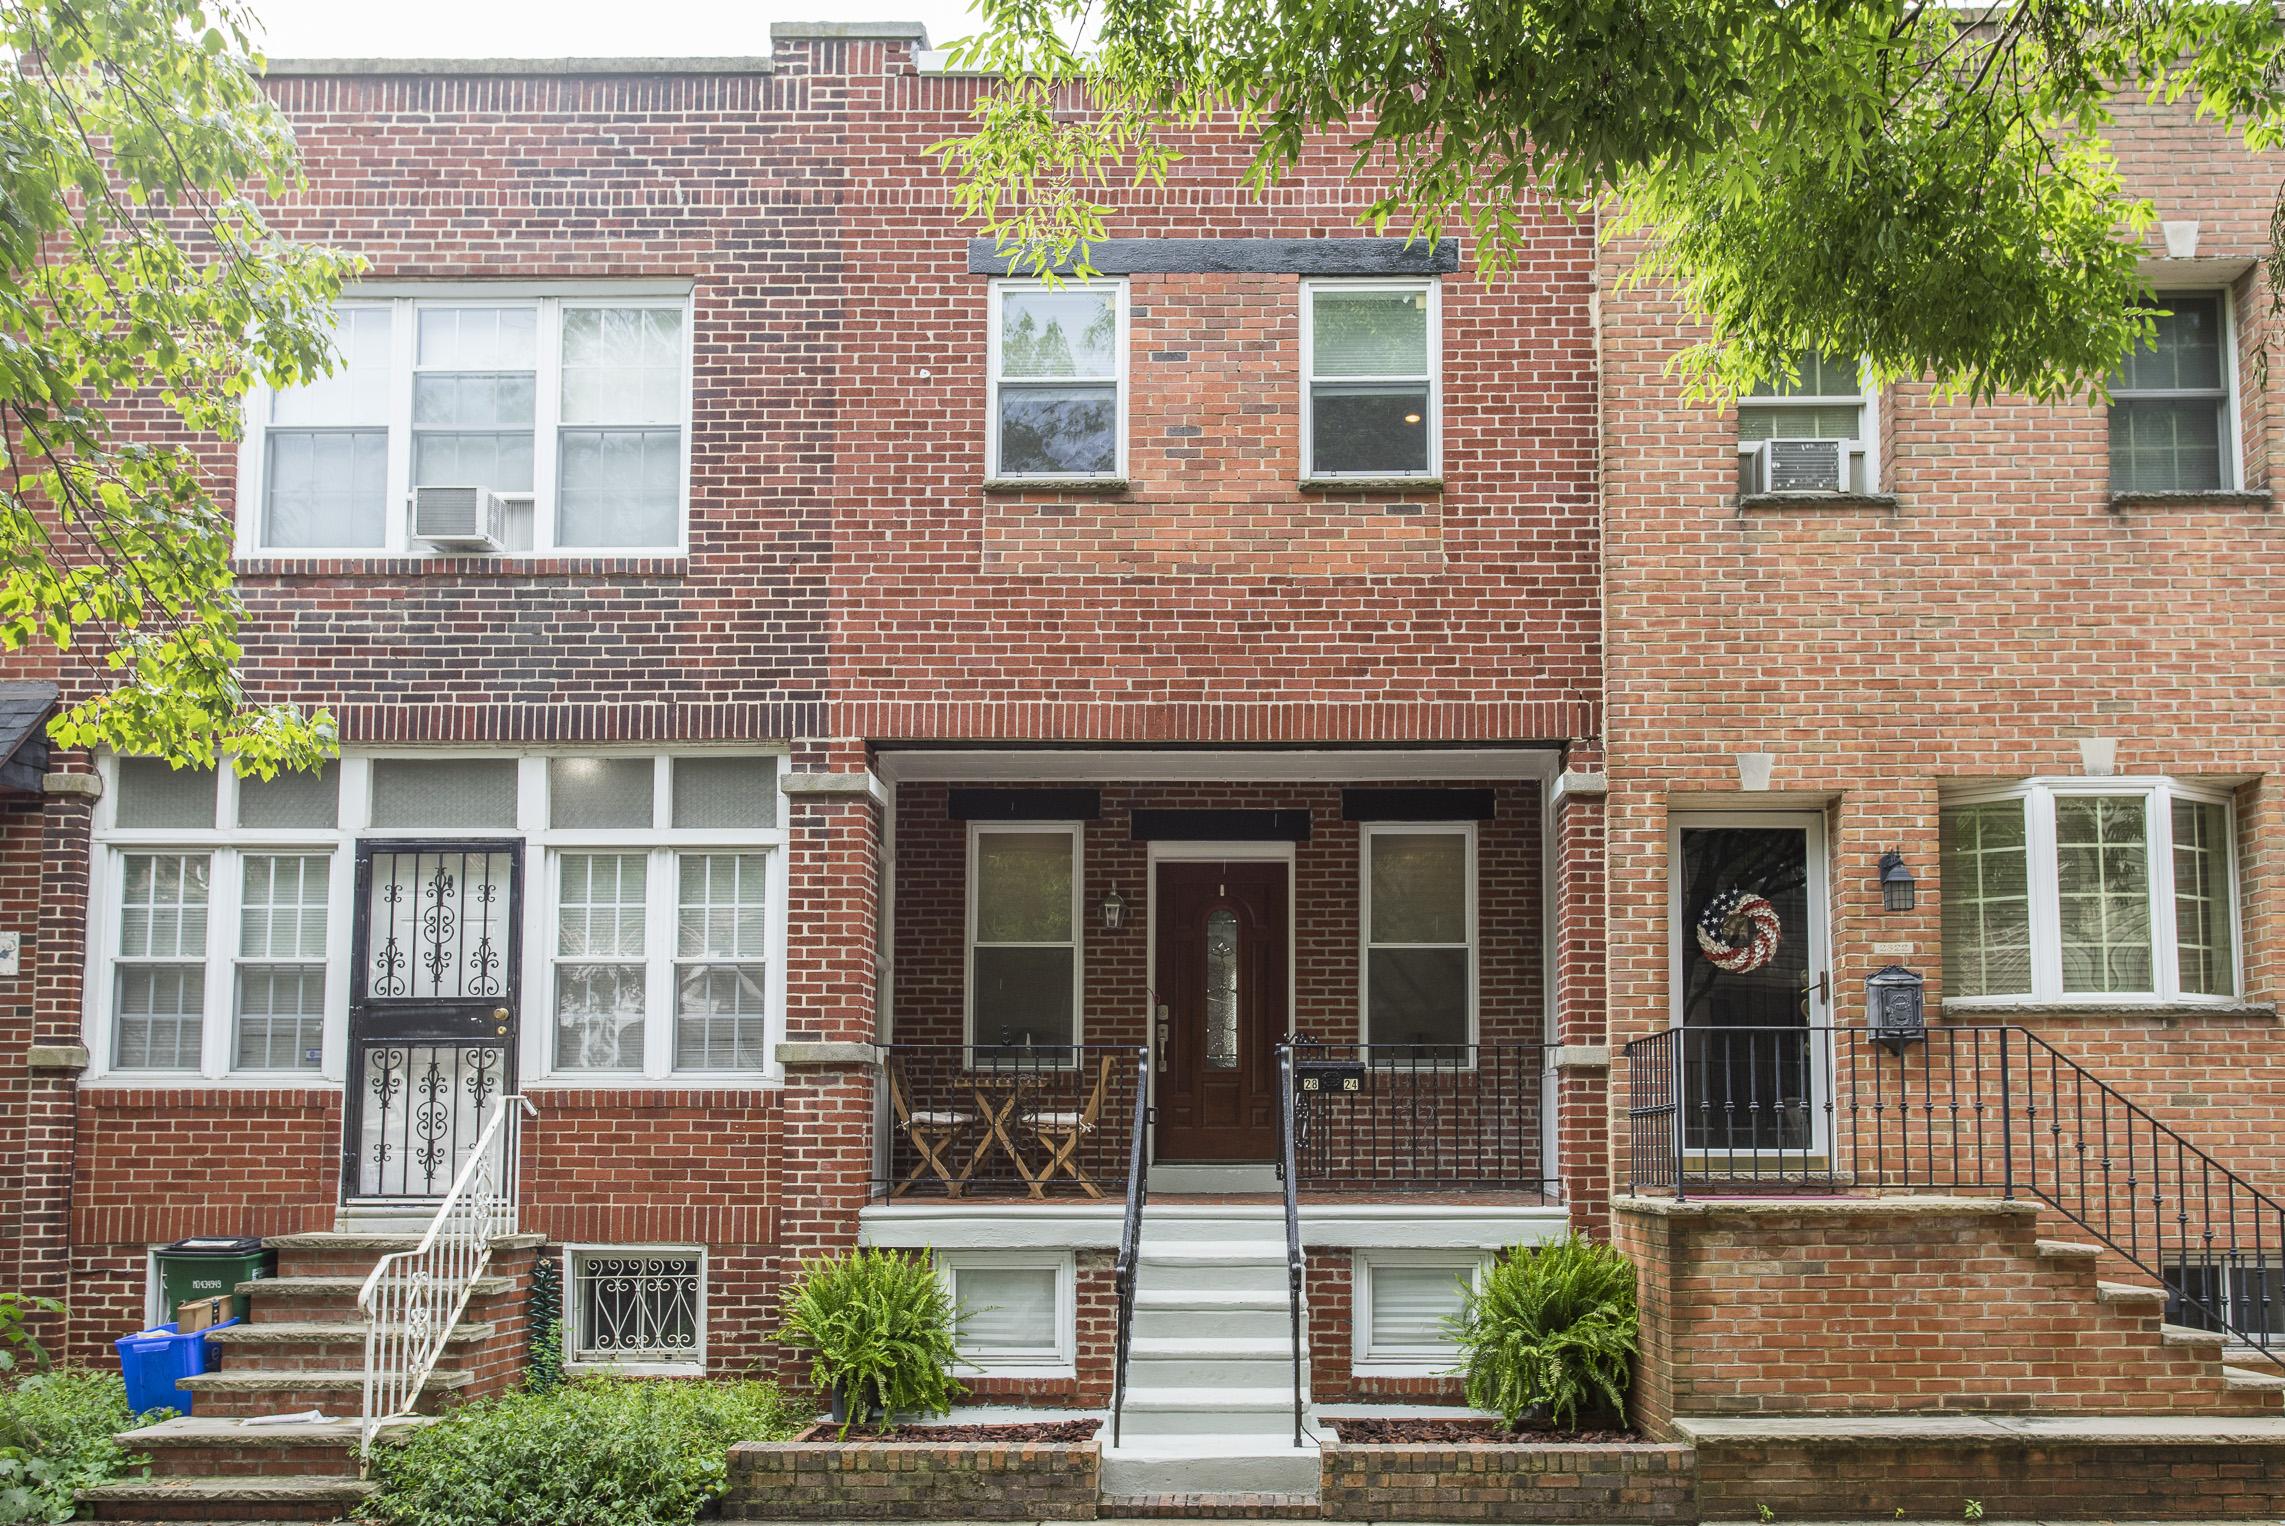 Sold | 2824 S 11th St - Philadelphia, PA 19148